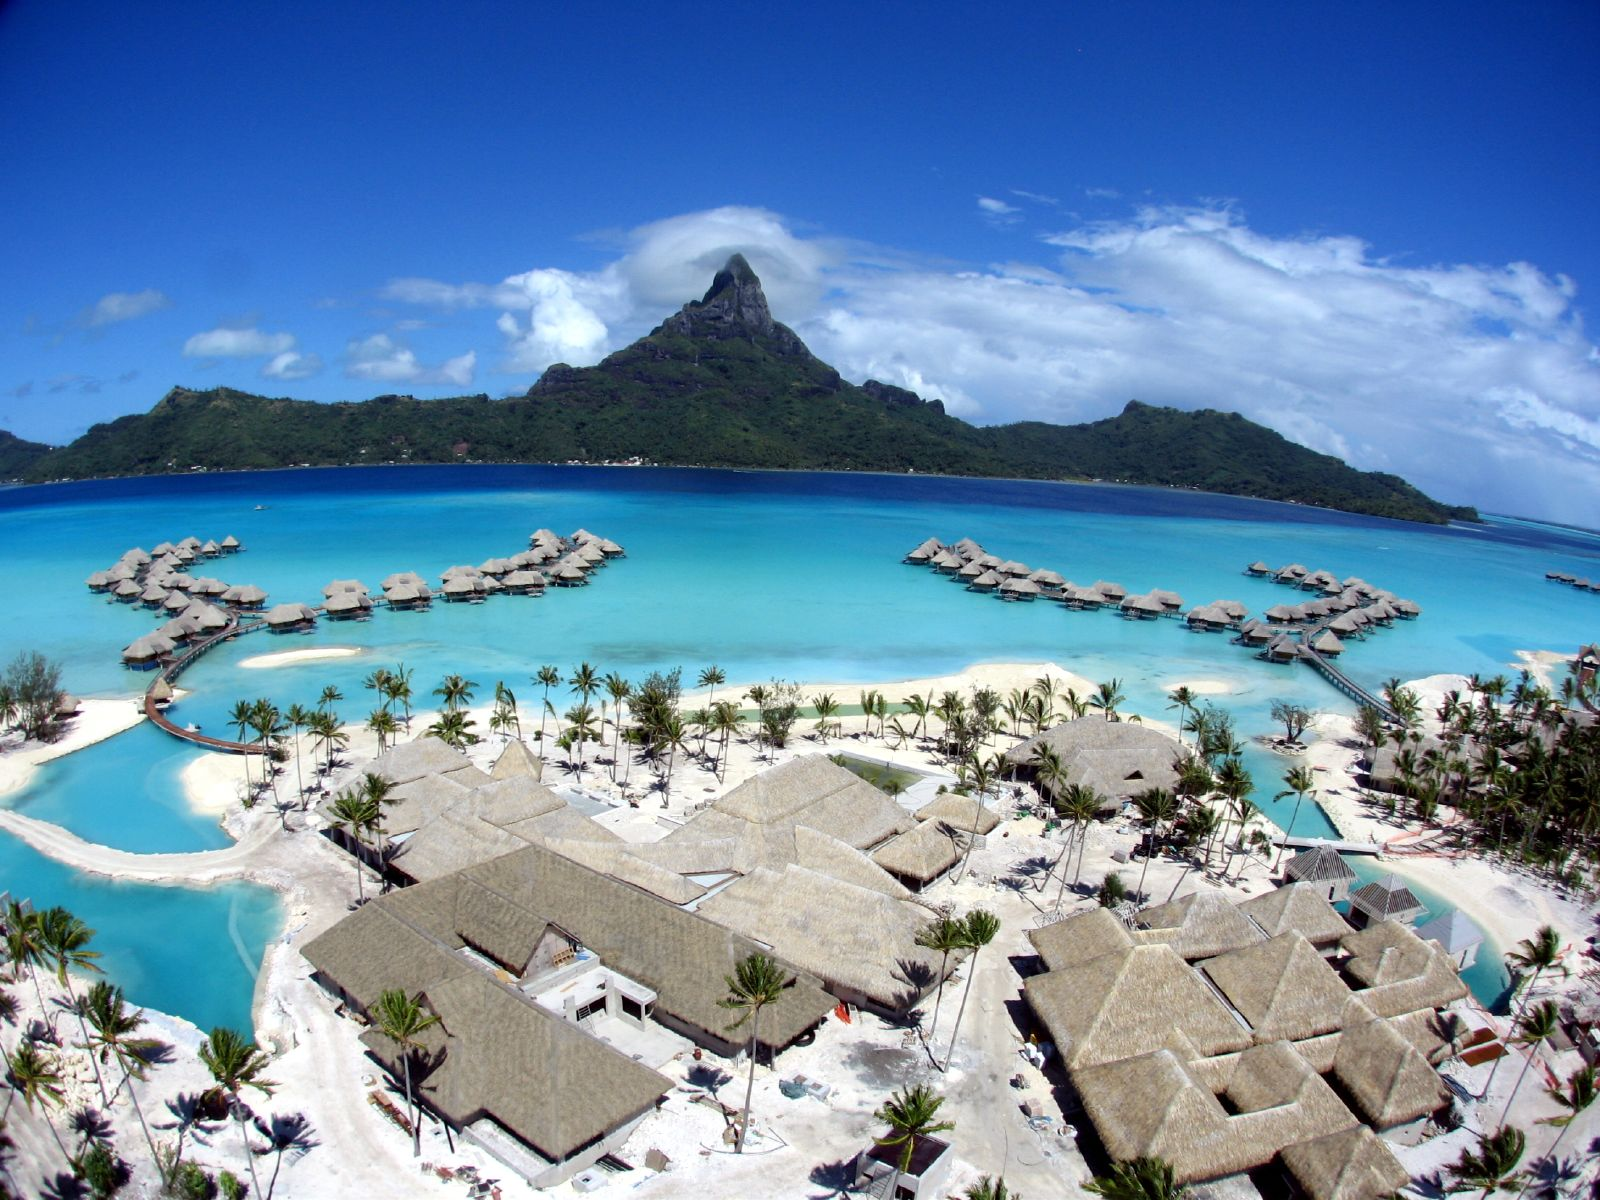 Bora Bora Tourism: Best of Bora Bora